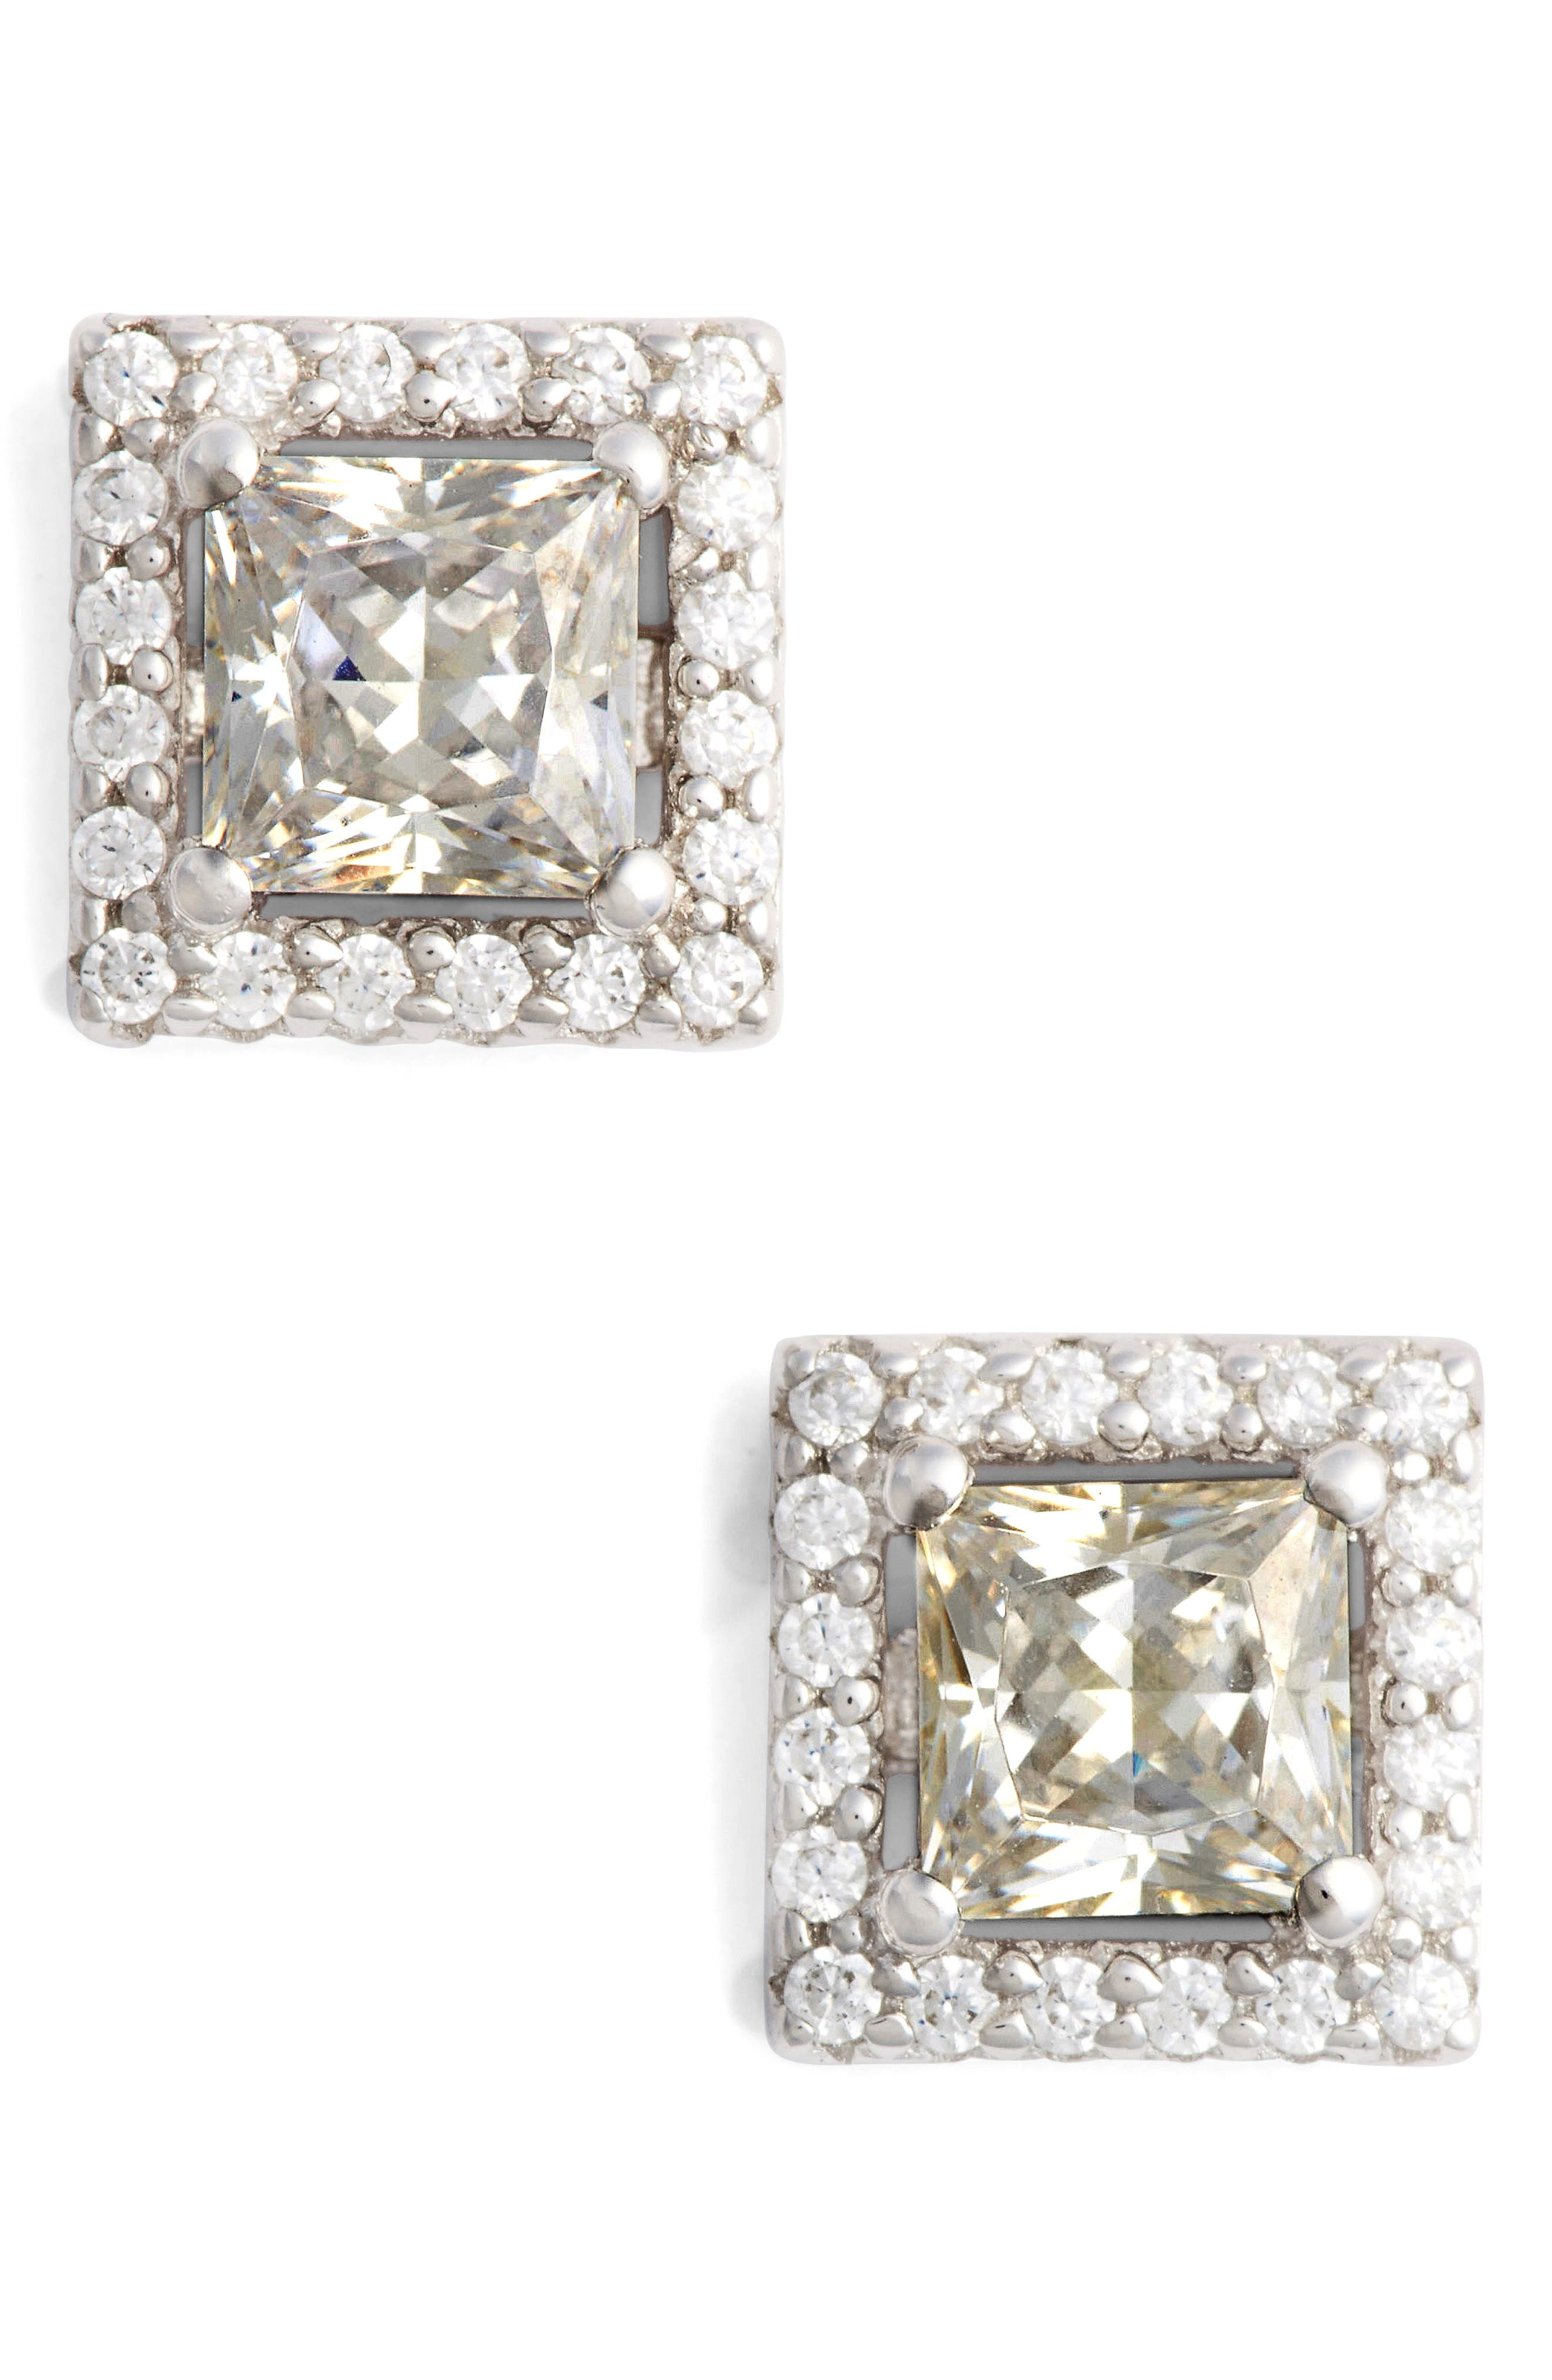 Princess Cut Simulated Diamond Stud Earrings,                             Main thumbnail 1, color,                             SILVER/ CLEAR